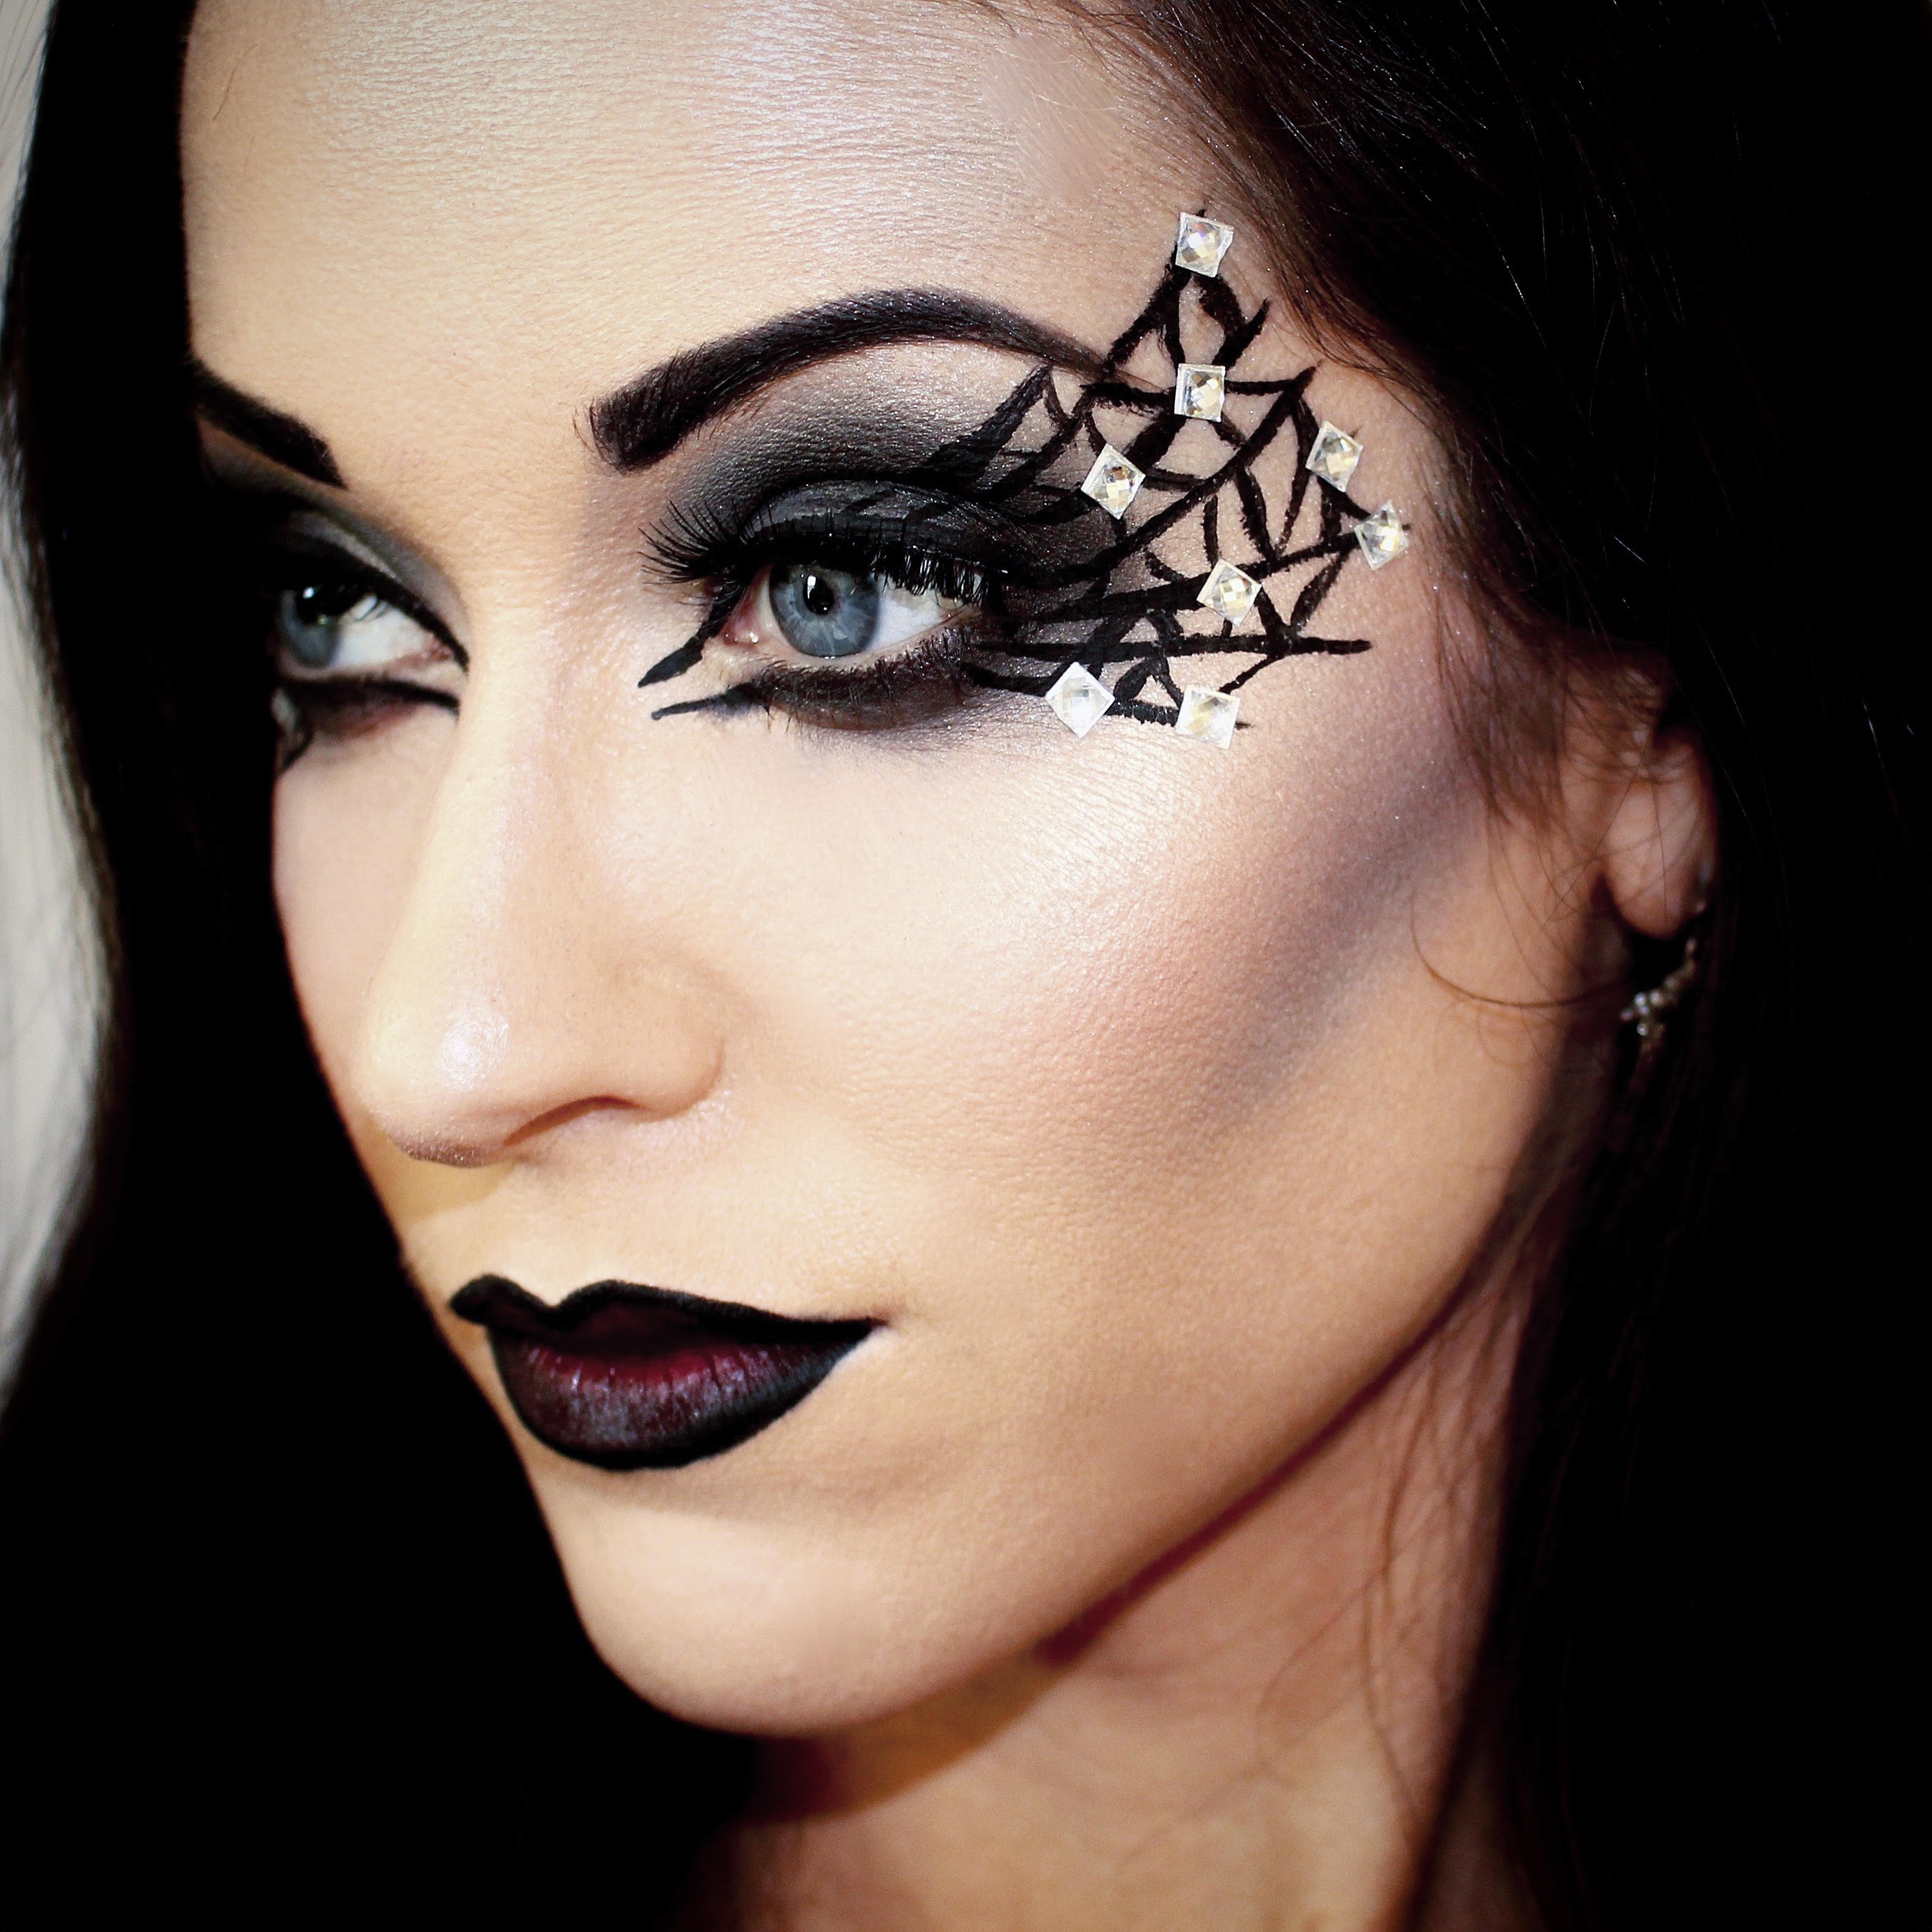 Witches Makeup How To Do It - Mugeek Vidalondon